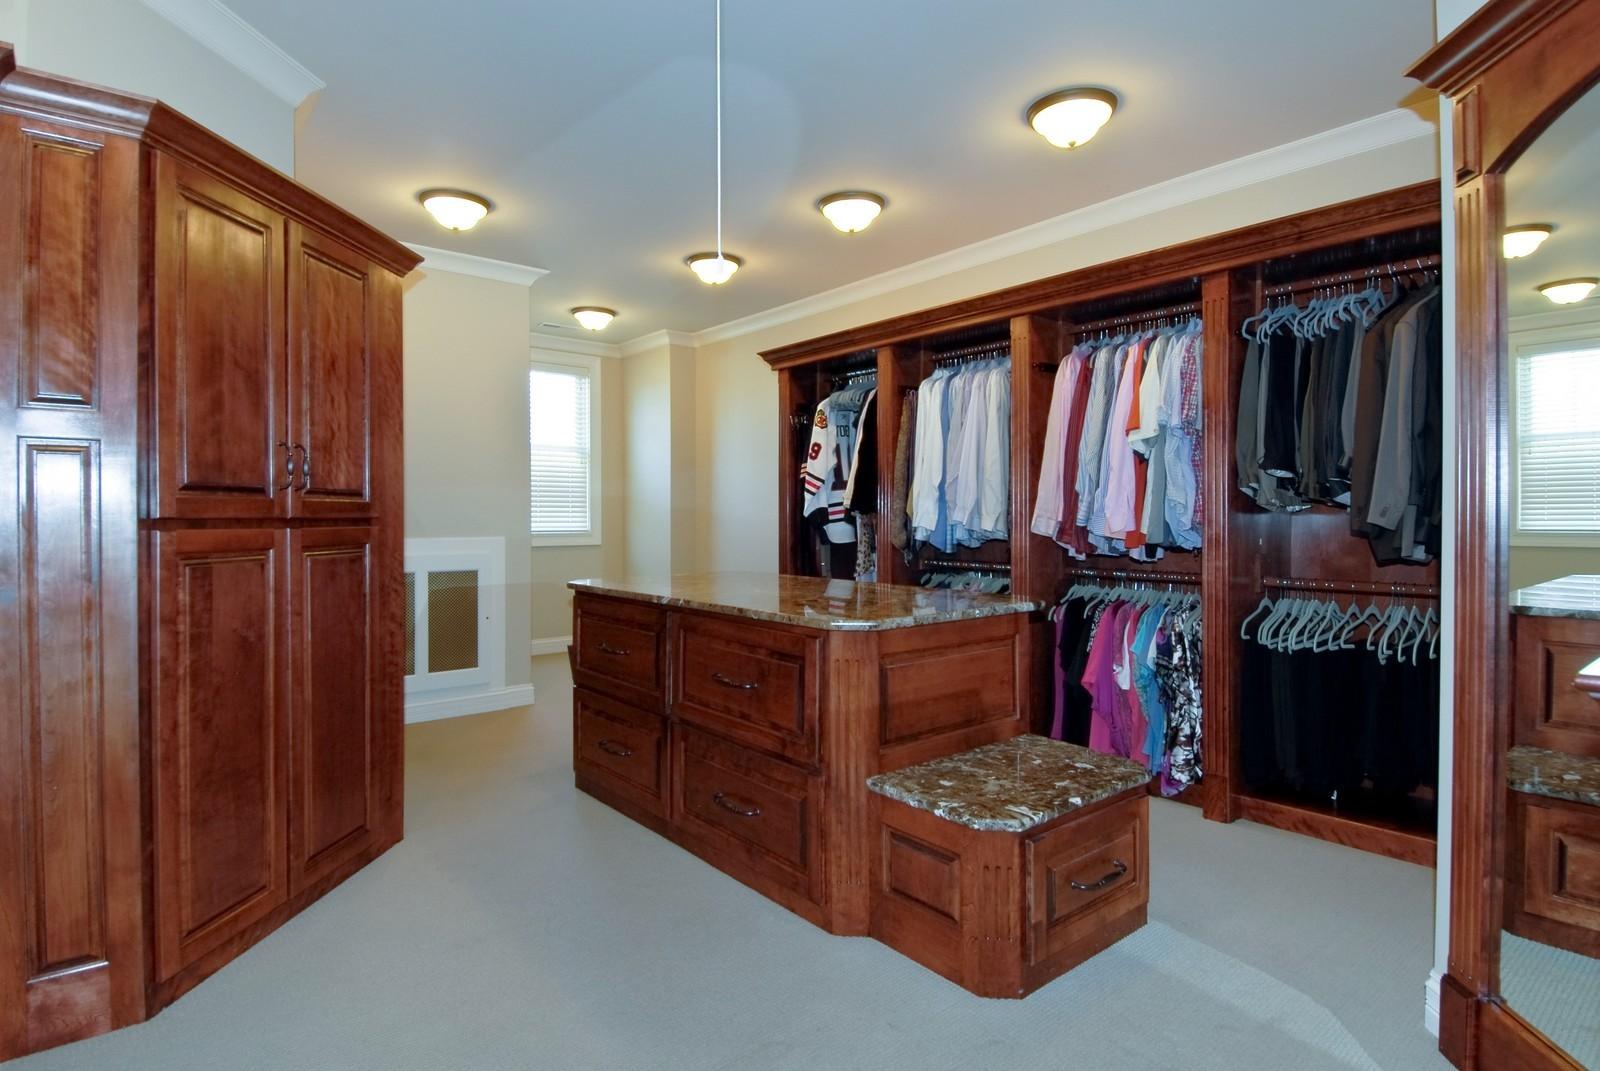 Real Estate Photography - 729 Wellner Dr, Naperville, IL, 60540 - Master Bedroom Closet